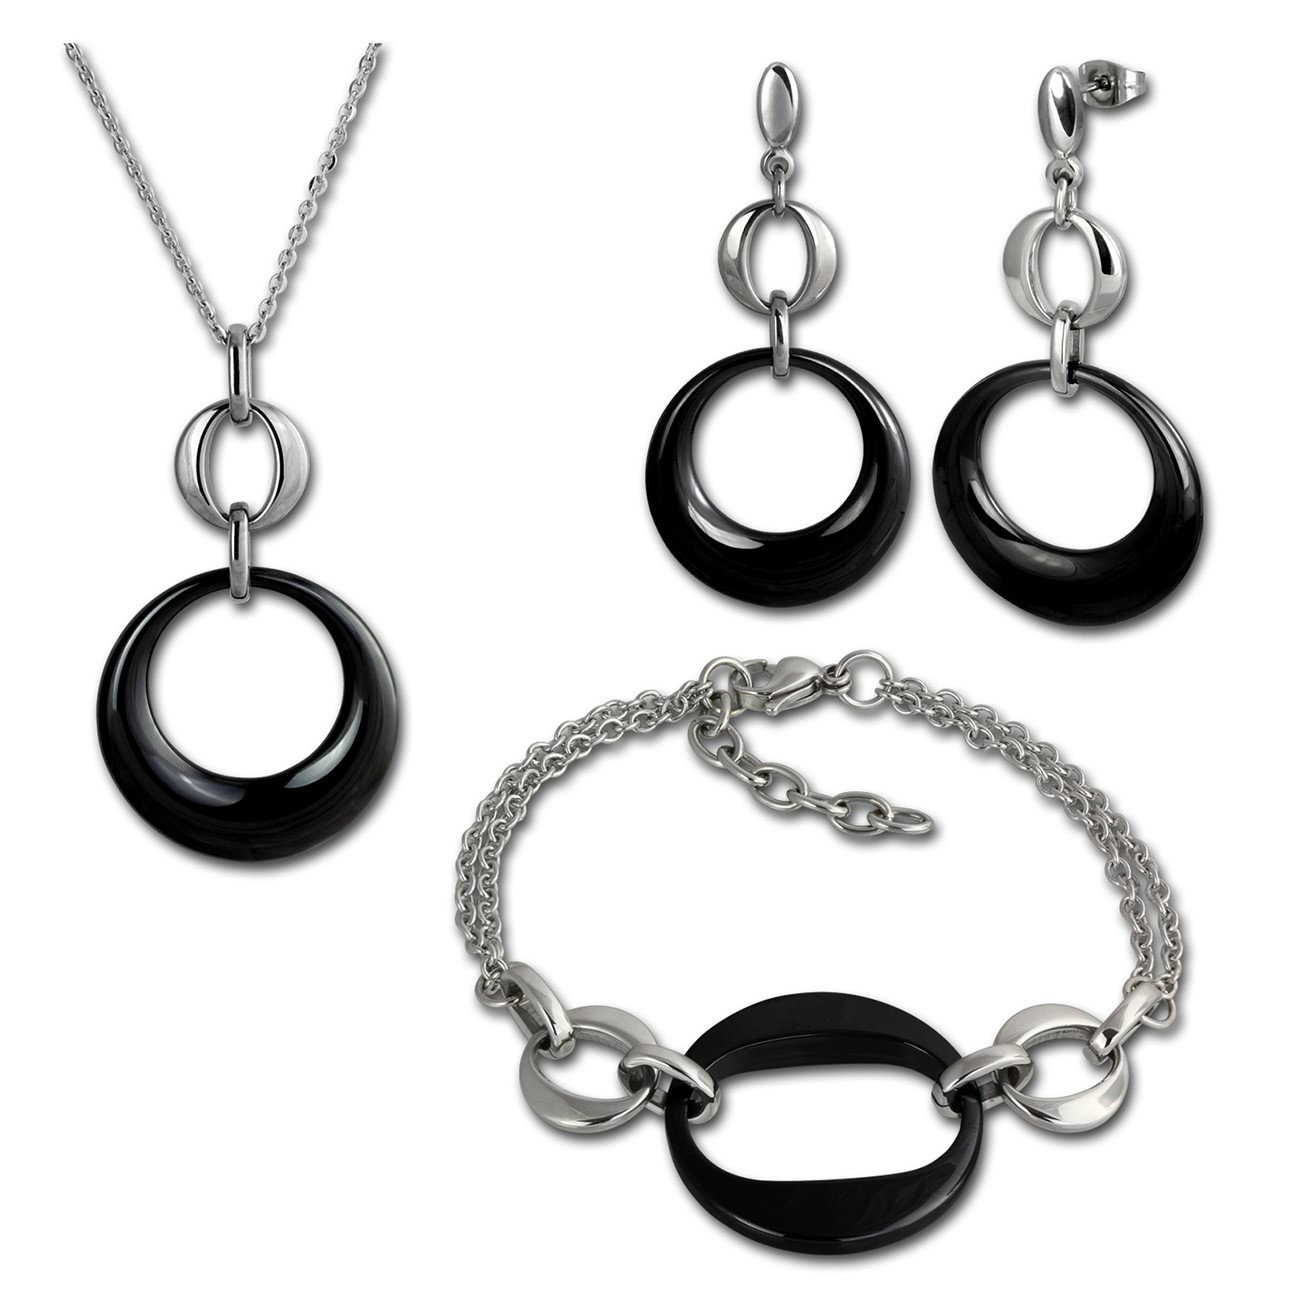 Amello Edelstahlschmuckset Round Keramik Kette, Armband, Ohrring ESSX13S